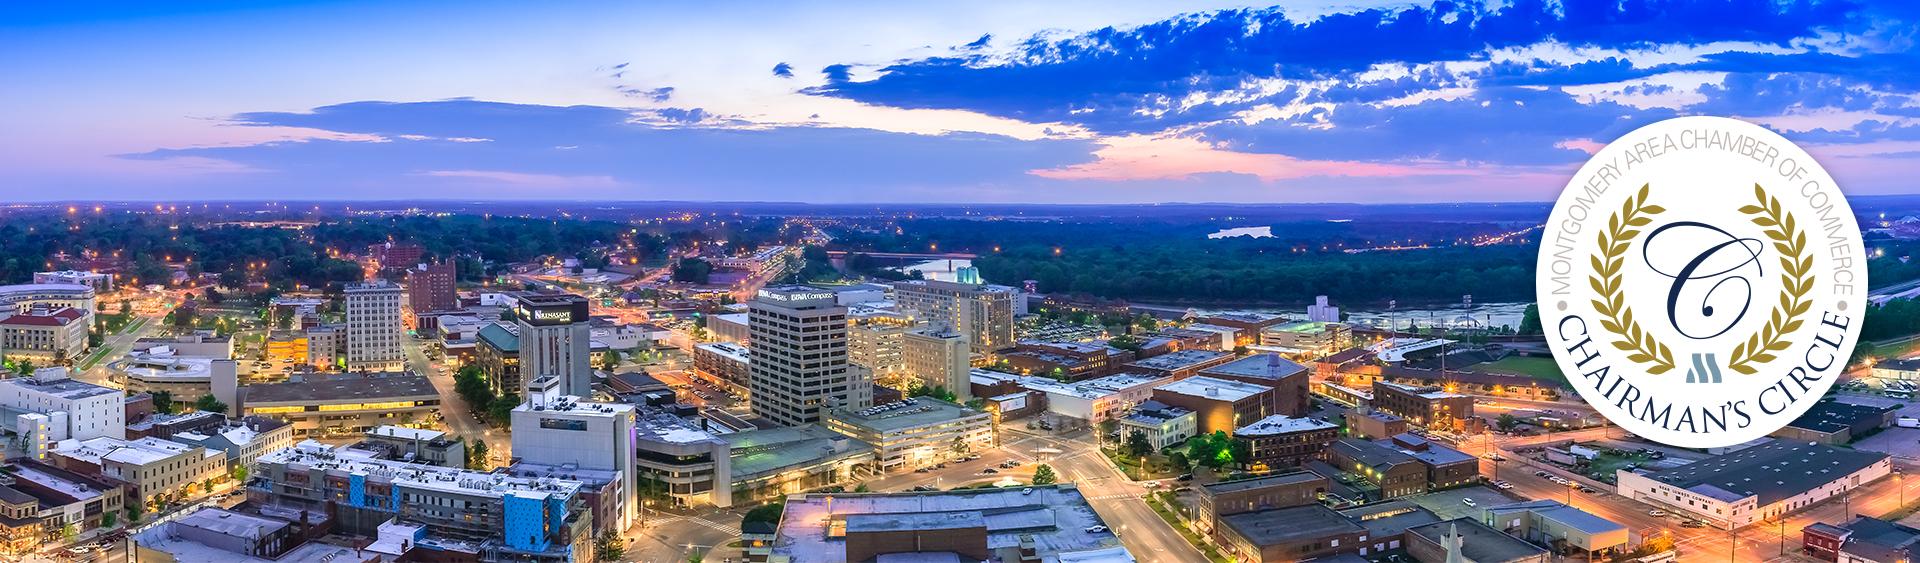 Eric Salas, Montgomery Skyline, Montgomery Area Chamber of Commerce,Montgomery Chamber, MGMChamber, Downtown Montgomery, Montgomery Alabama, Chairman's Circle